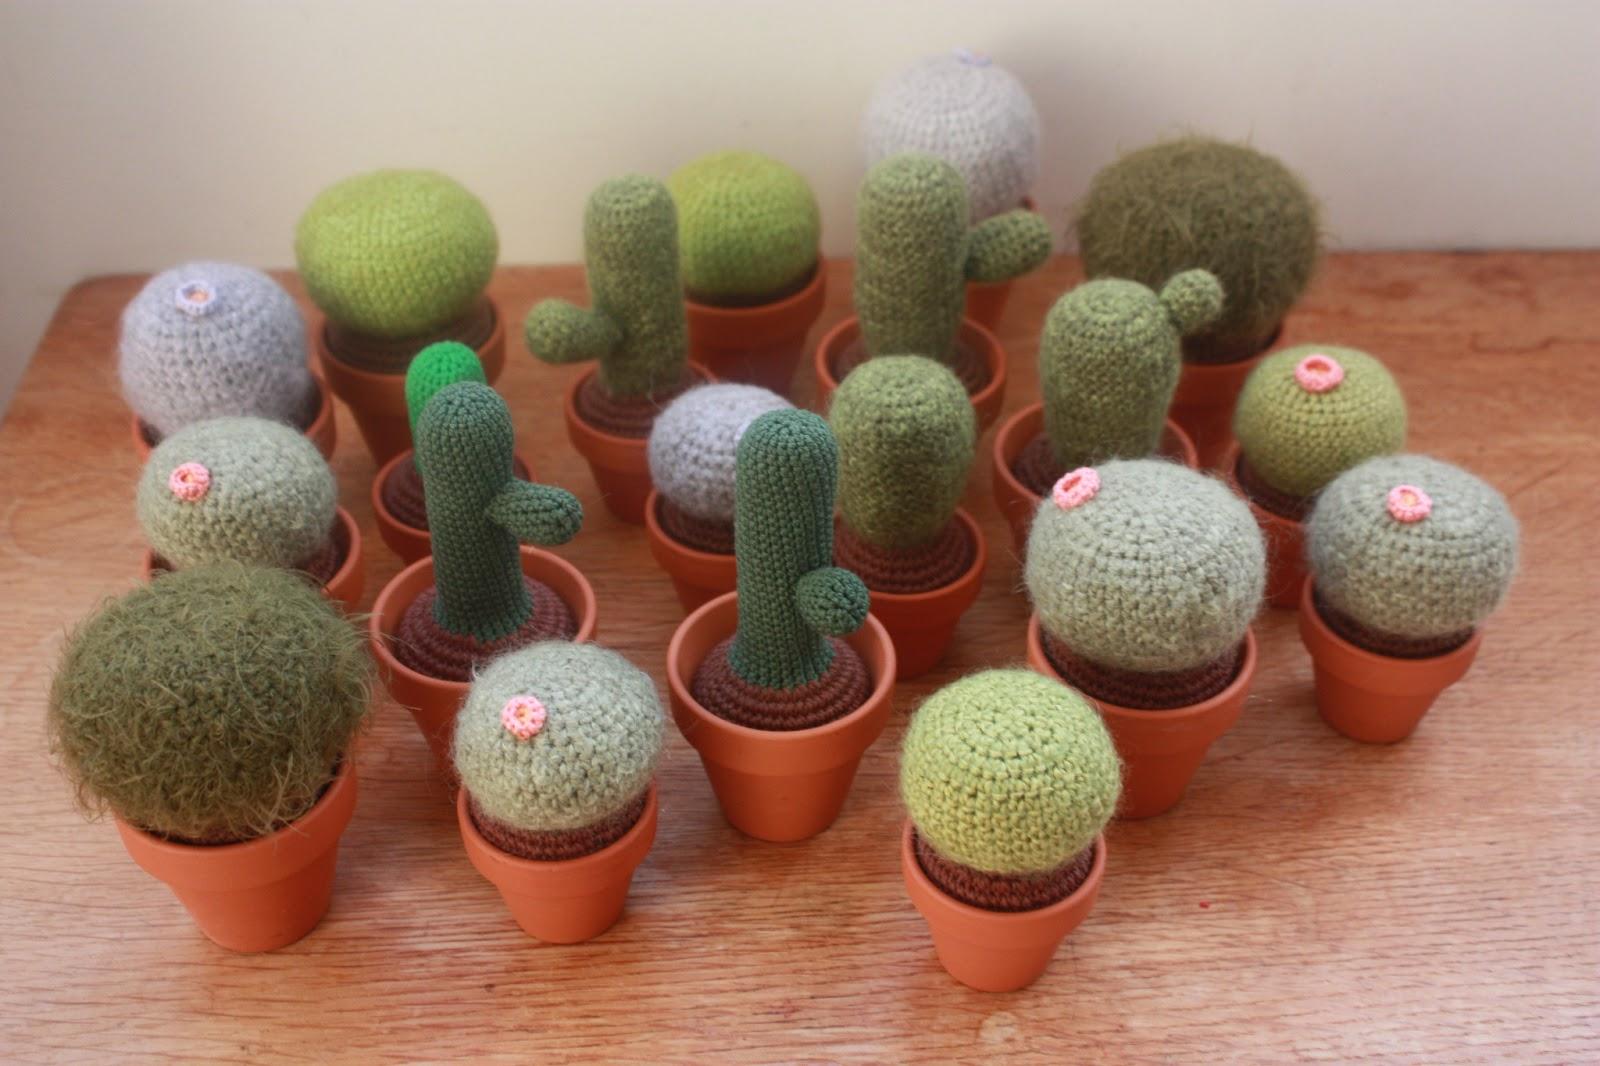 Crochet Guru : Amigurumi creations by Happyamigurumi: Cacti, crochet ones :)